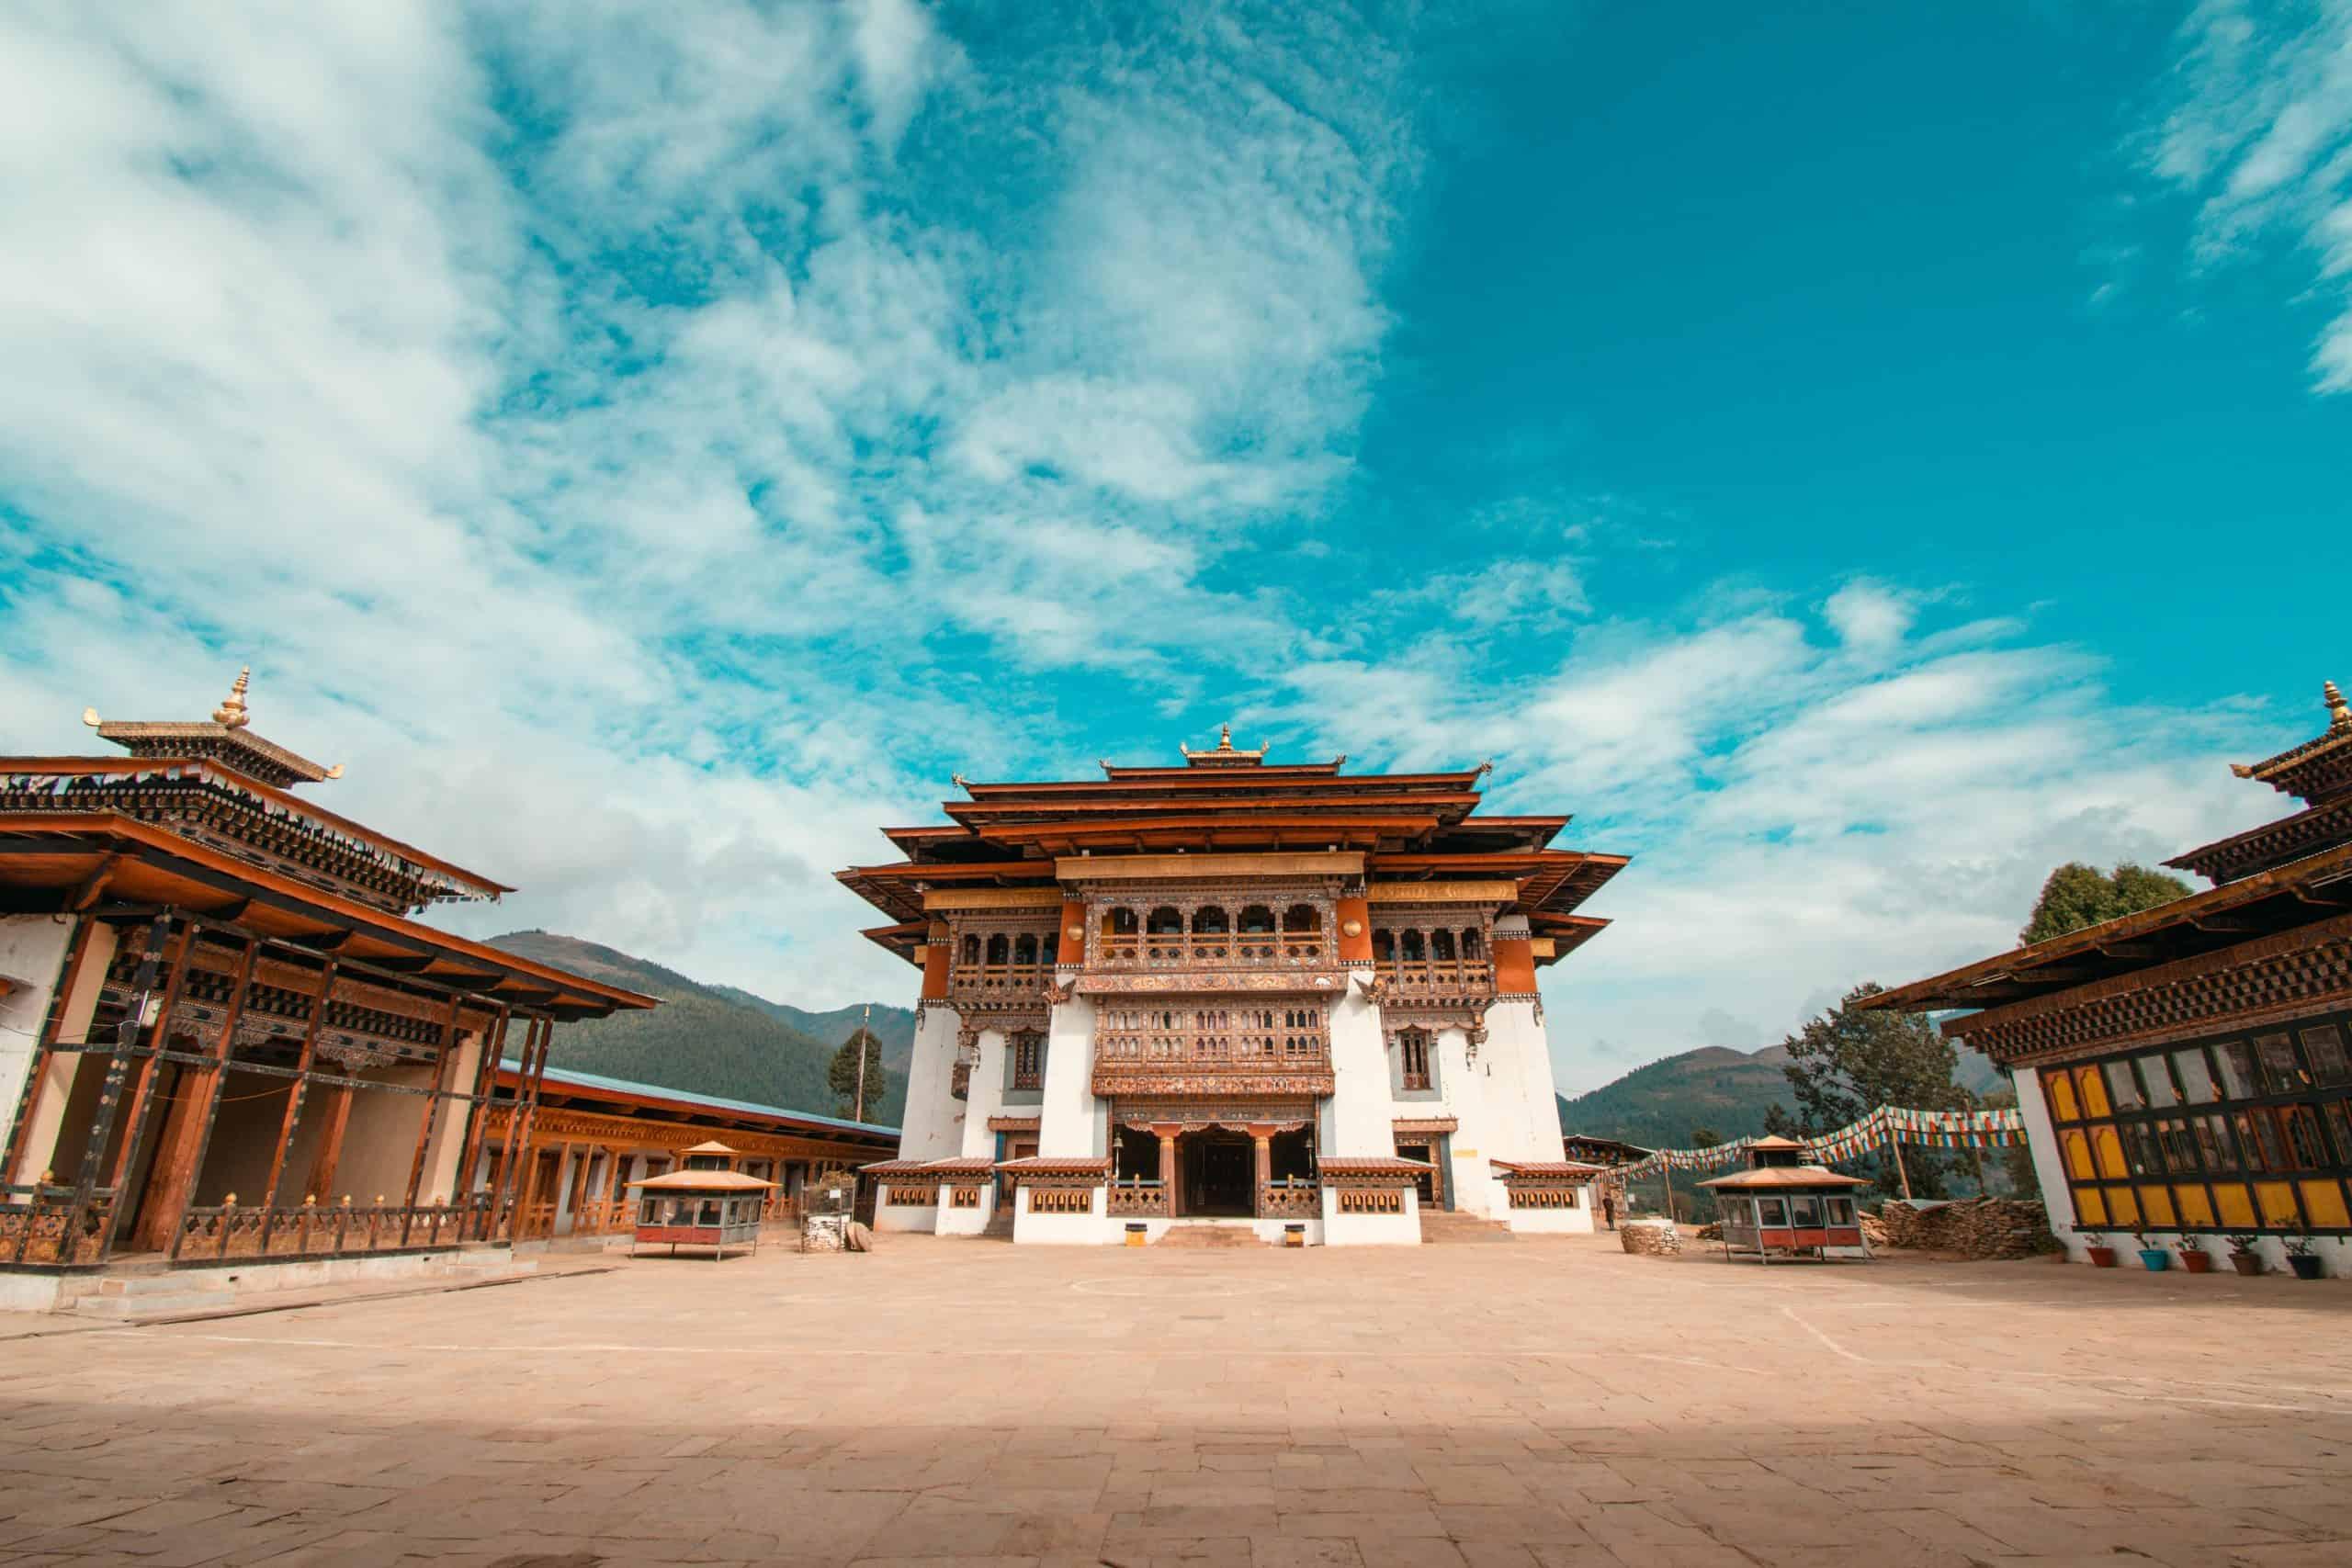 Dzong in Bhutan